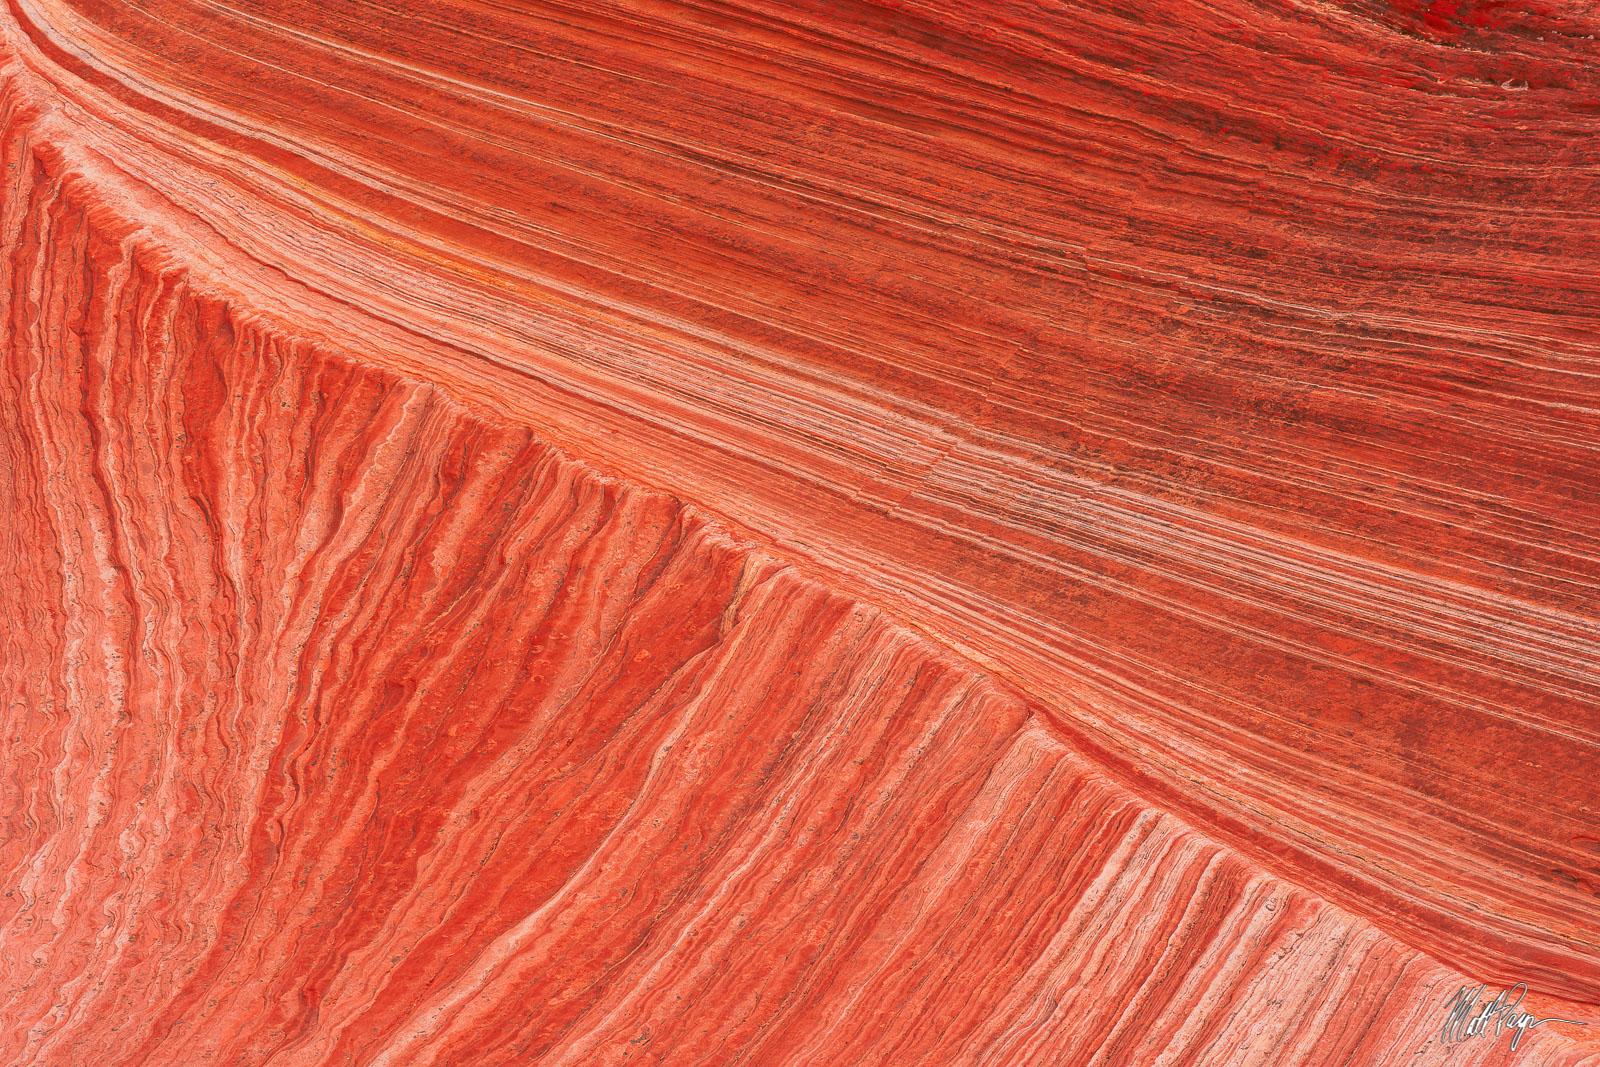 Arizona, Landscape, March, Rock, Sandstone, Southwest, Spring, Vermillion Cliffs National Monument, abstract, bacon, desert, slab, photo